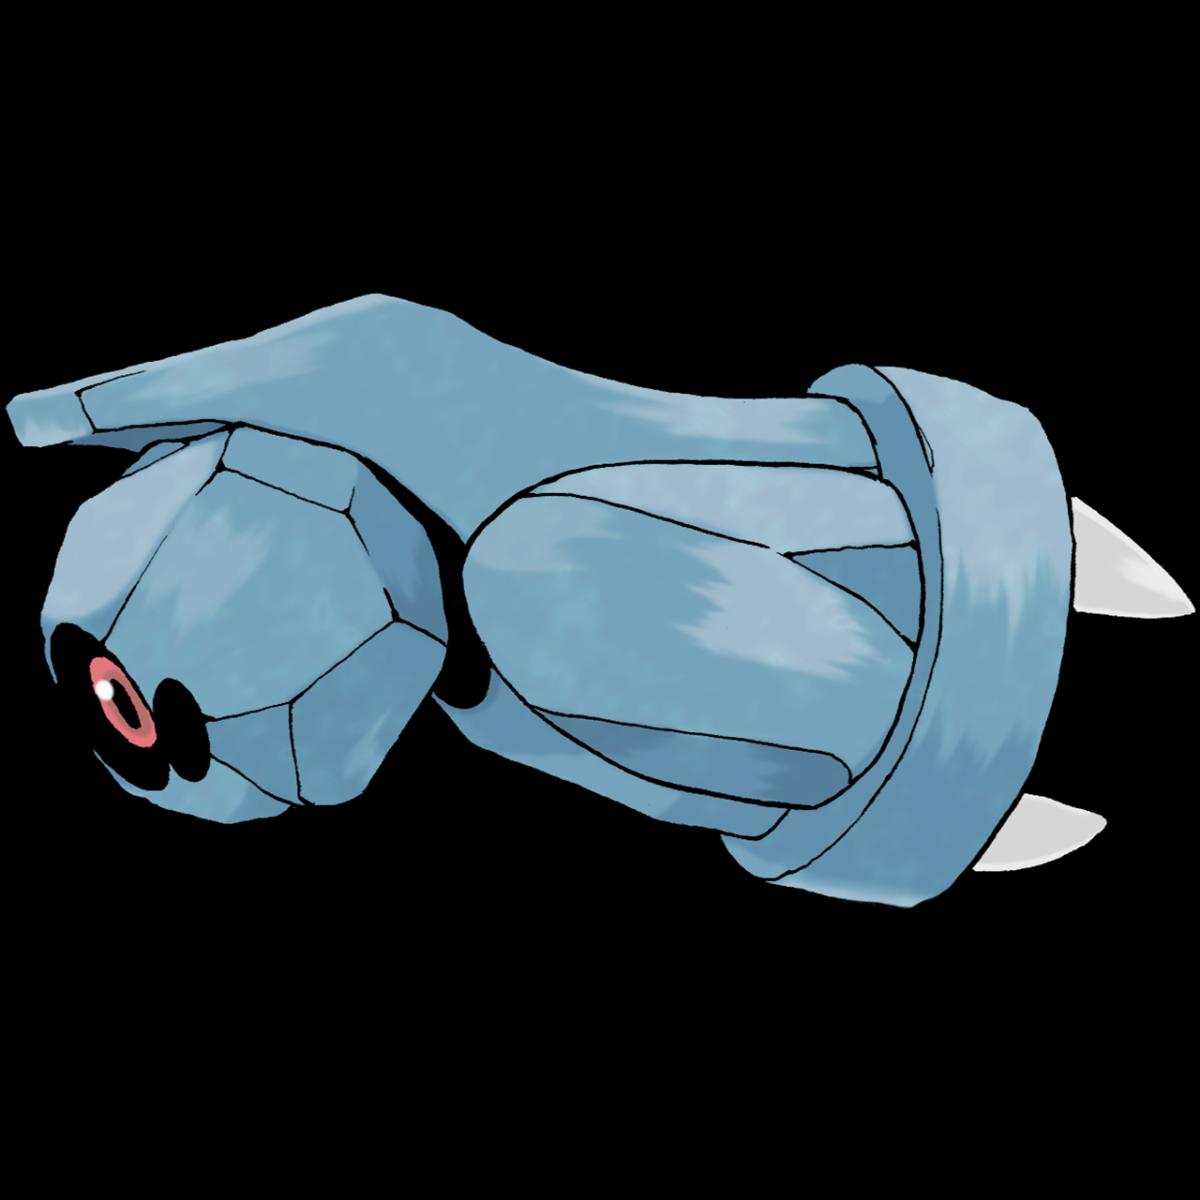 374 Beldum – Rate That Pokemon